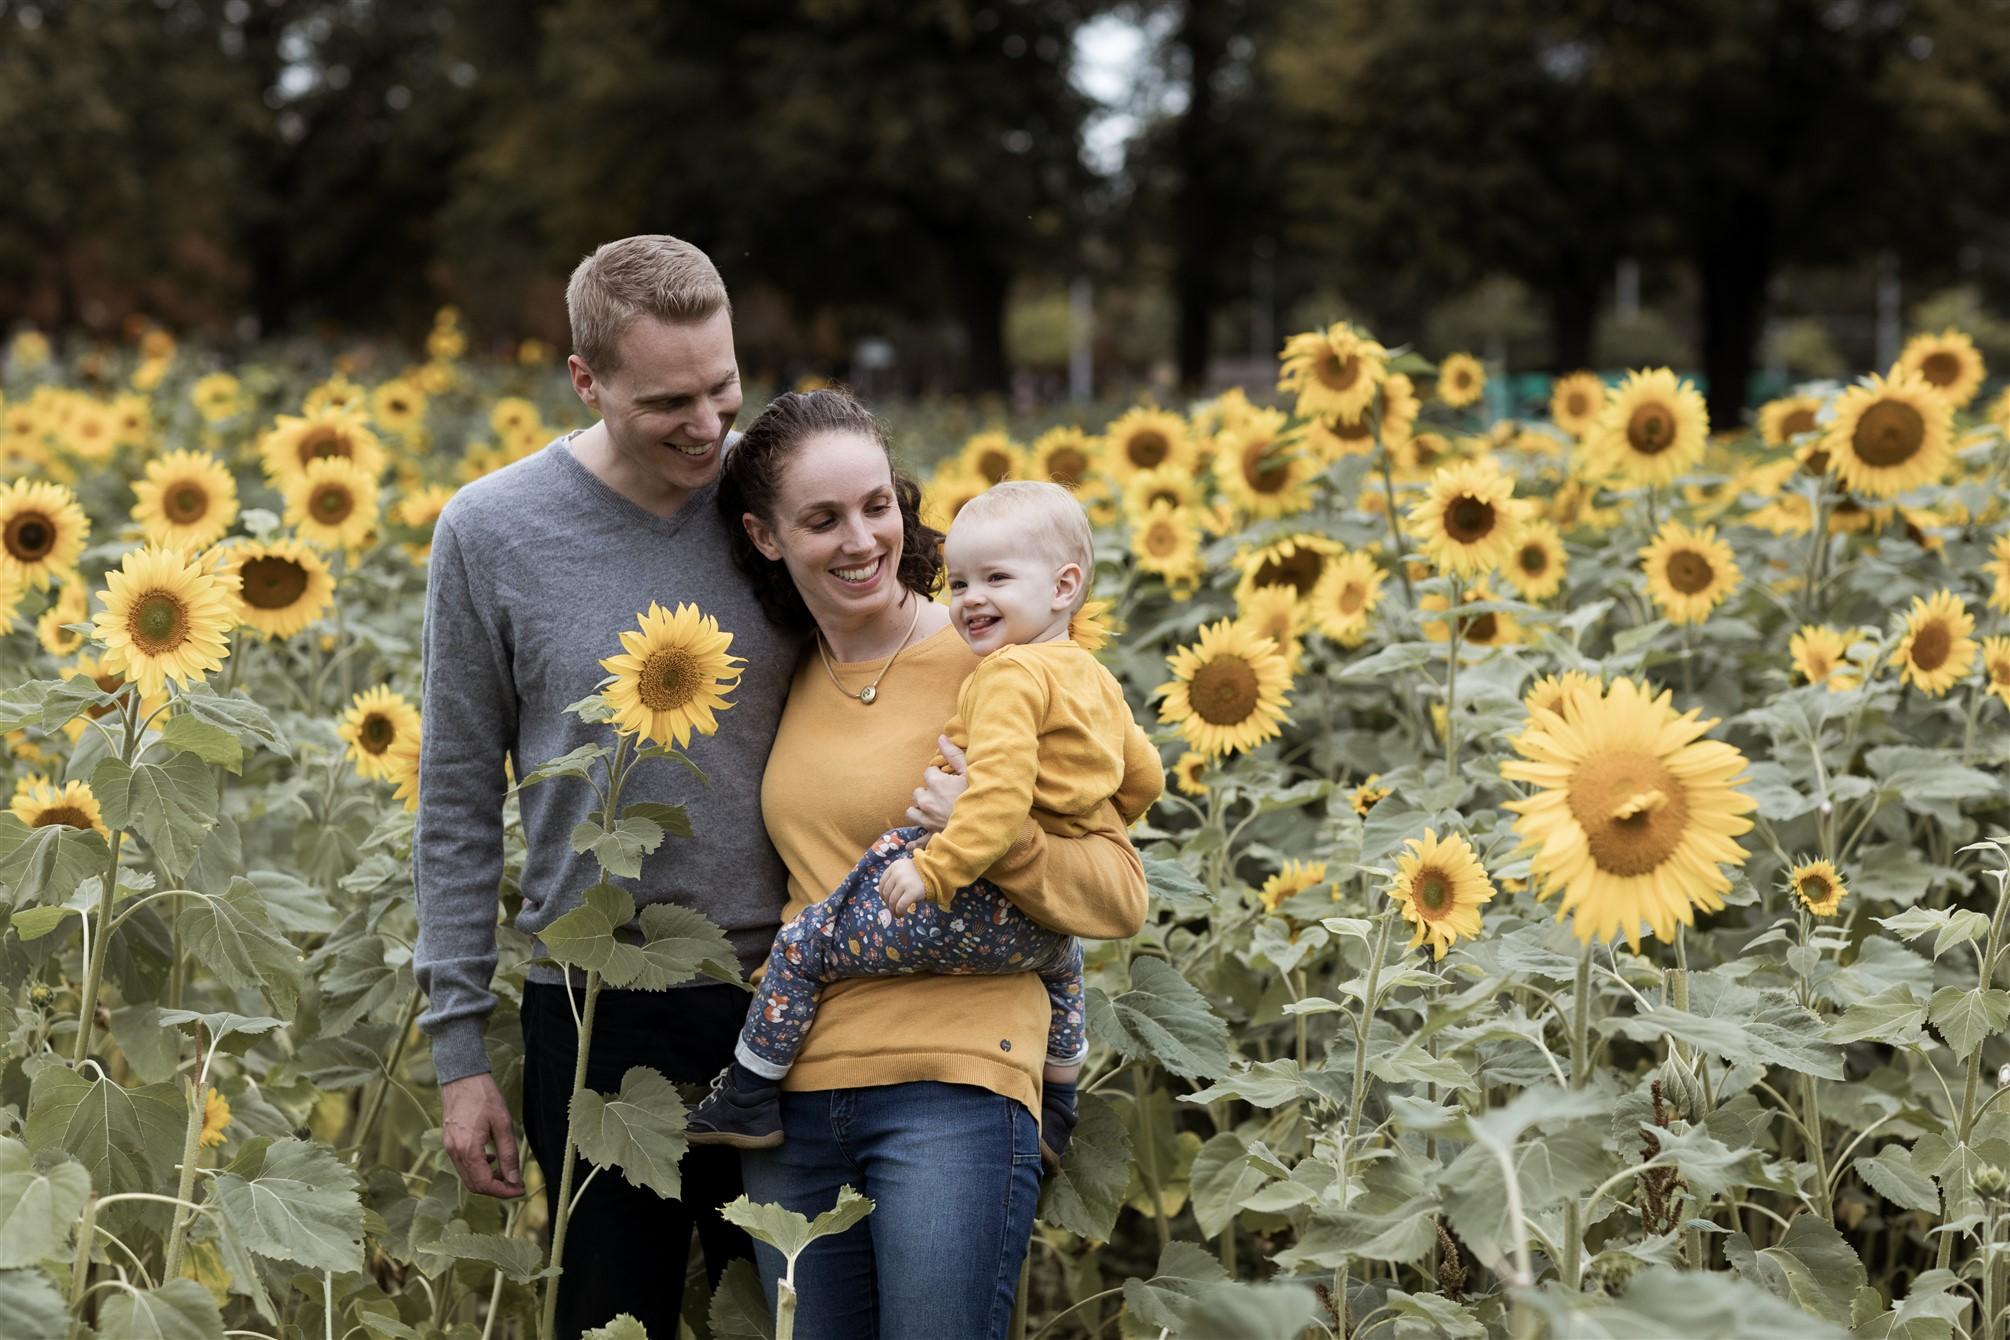 Familien Fotoshooting in Basel - Familienfotoshooting inmitten von Sonnenblumen